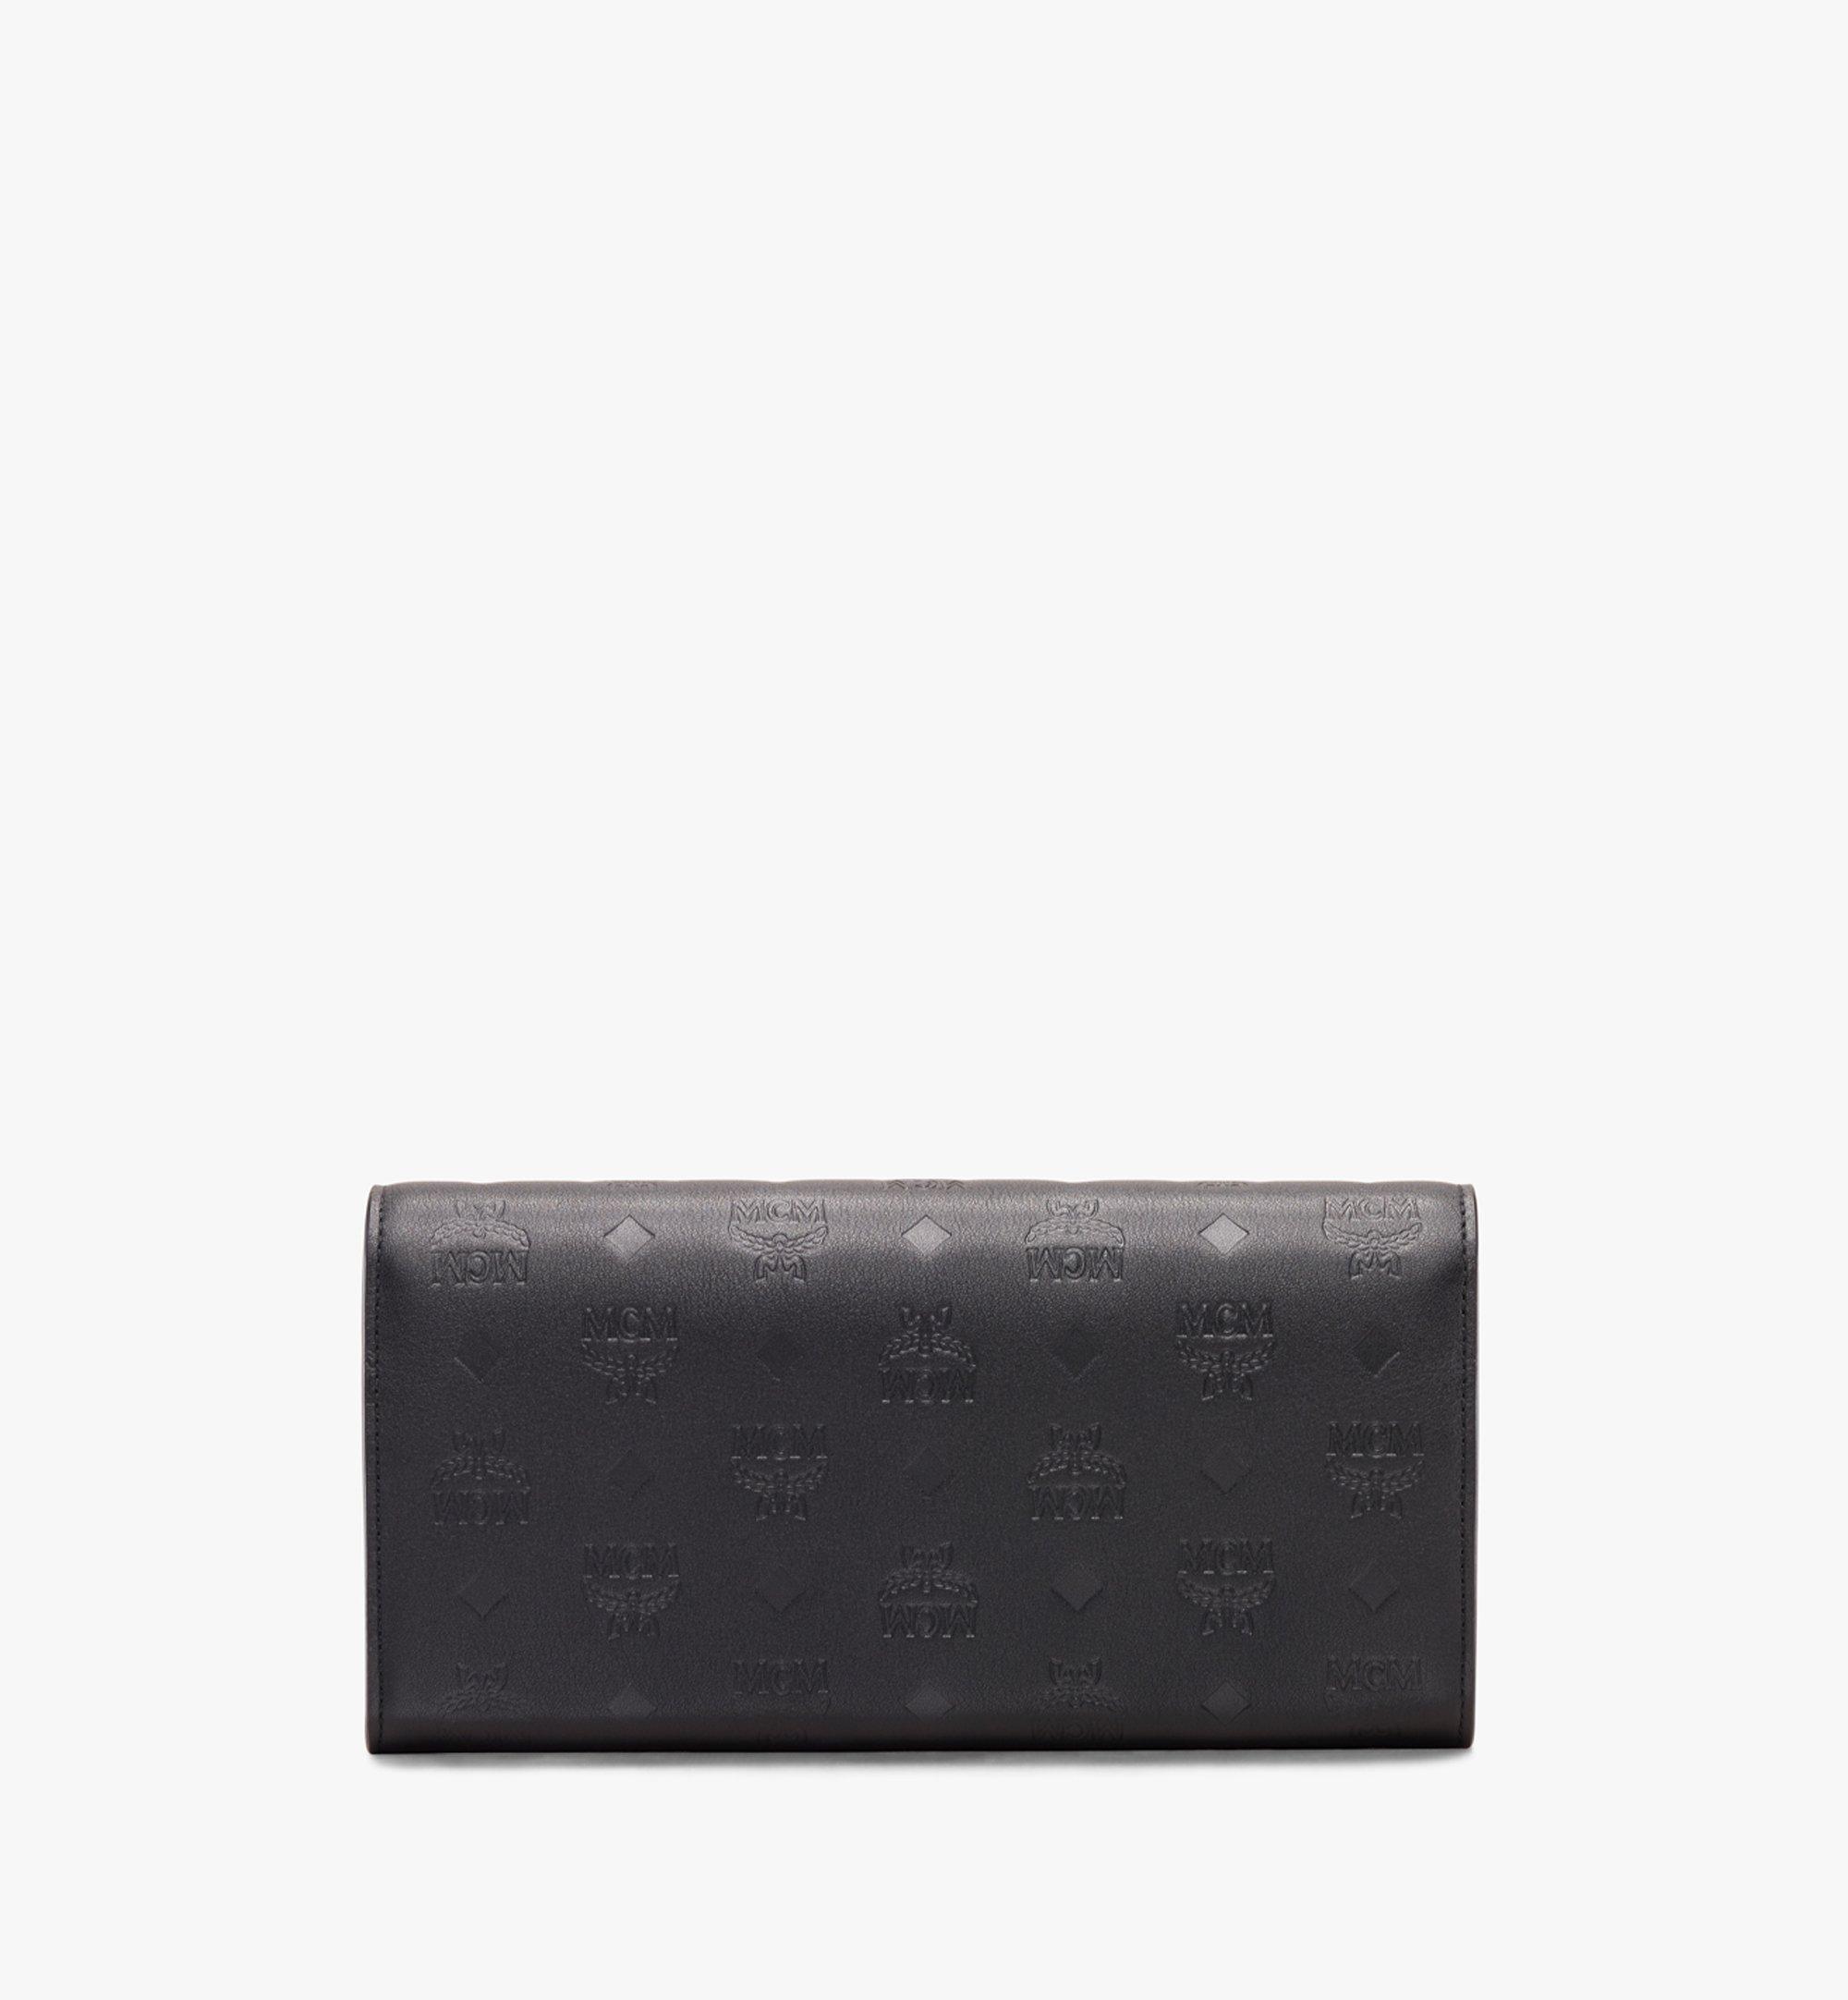 MCM Love Letter Crossbody Wallet in Colorblock Visetos Black MYL9ALV11BK001 Alternate View 1